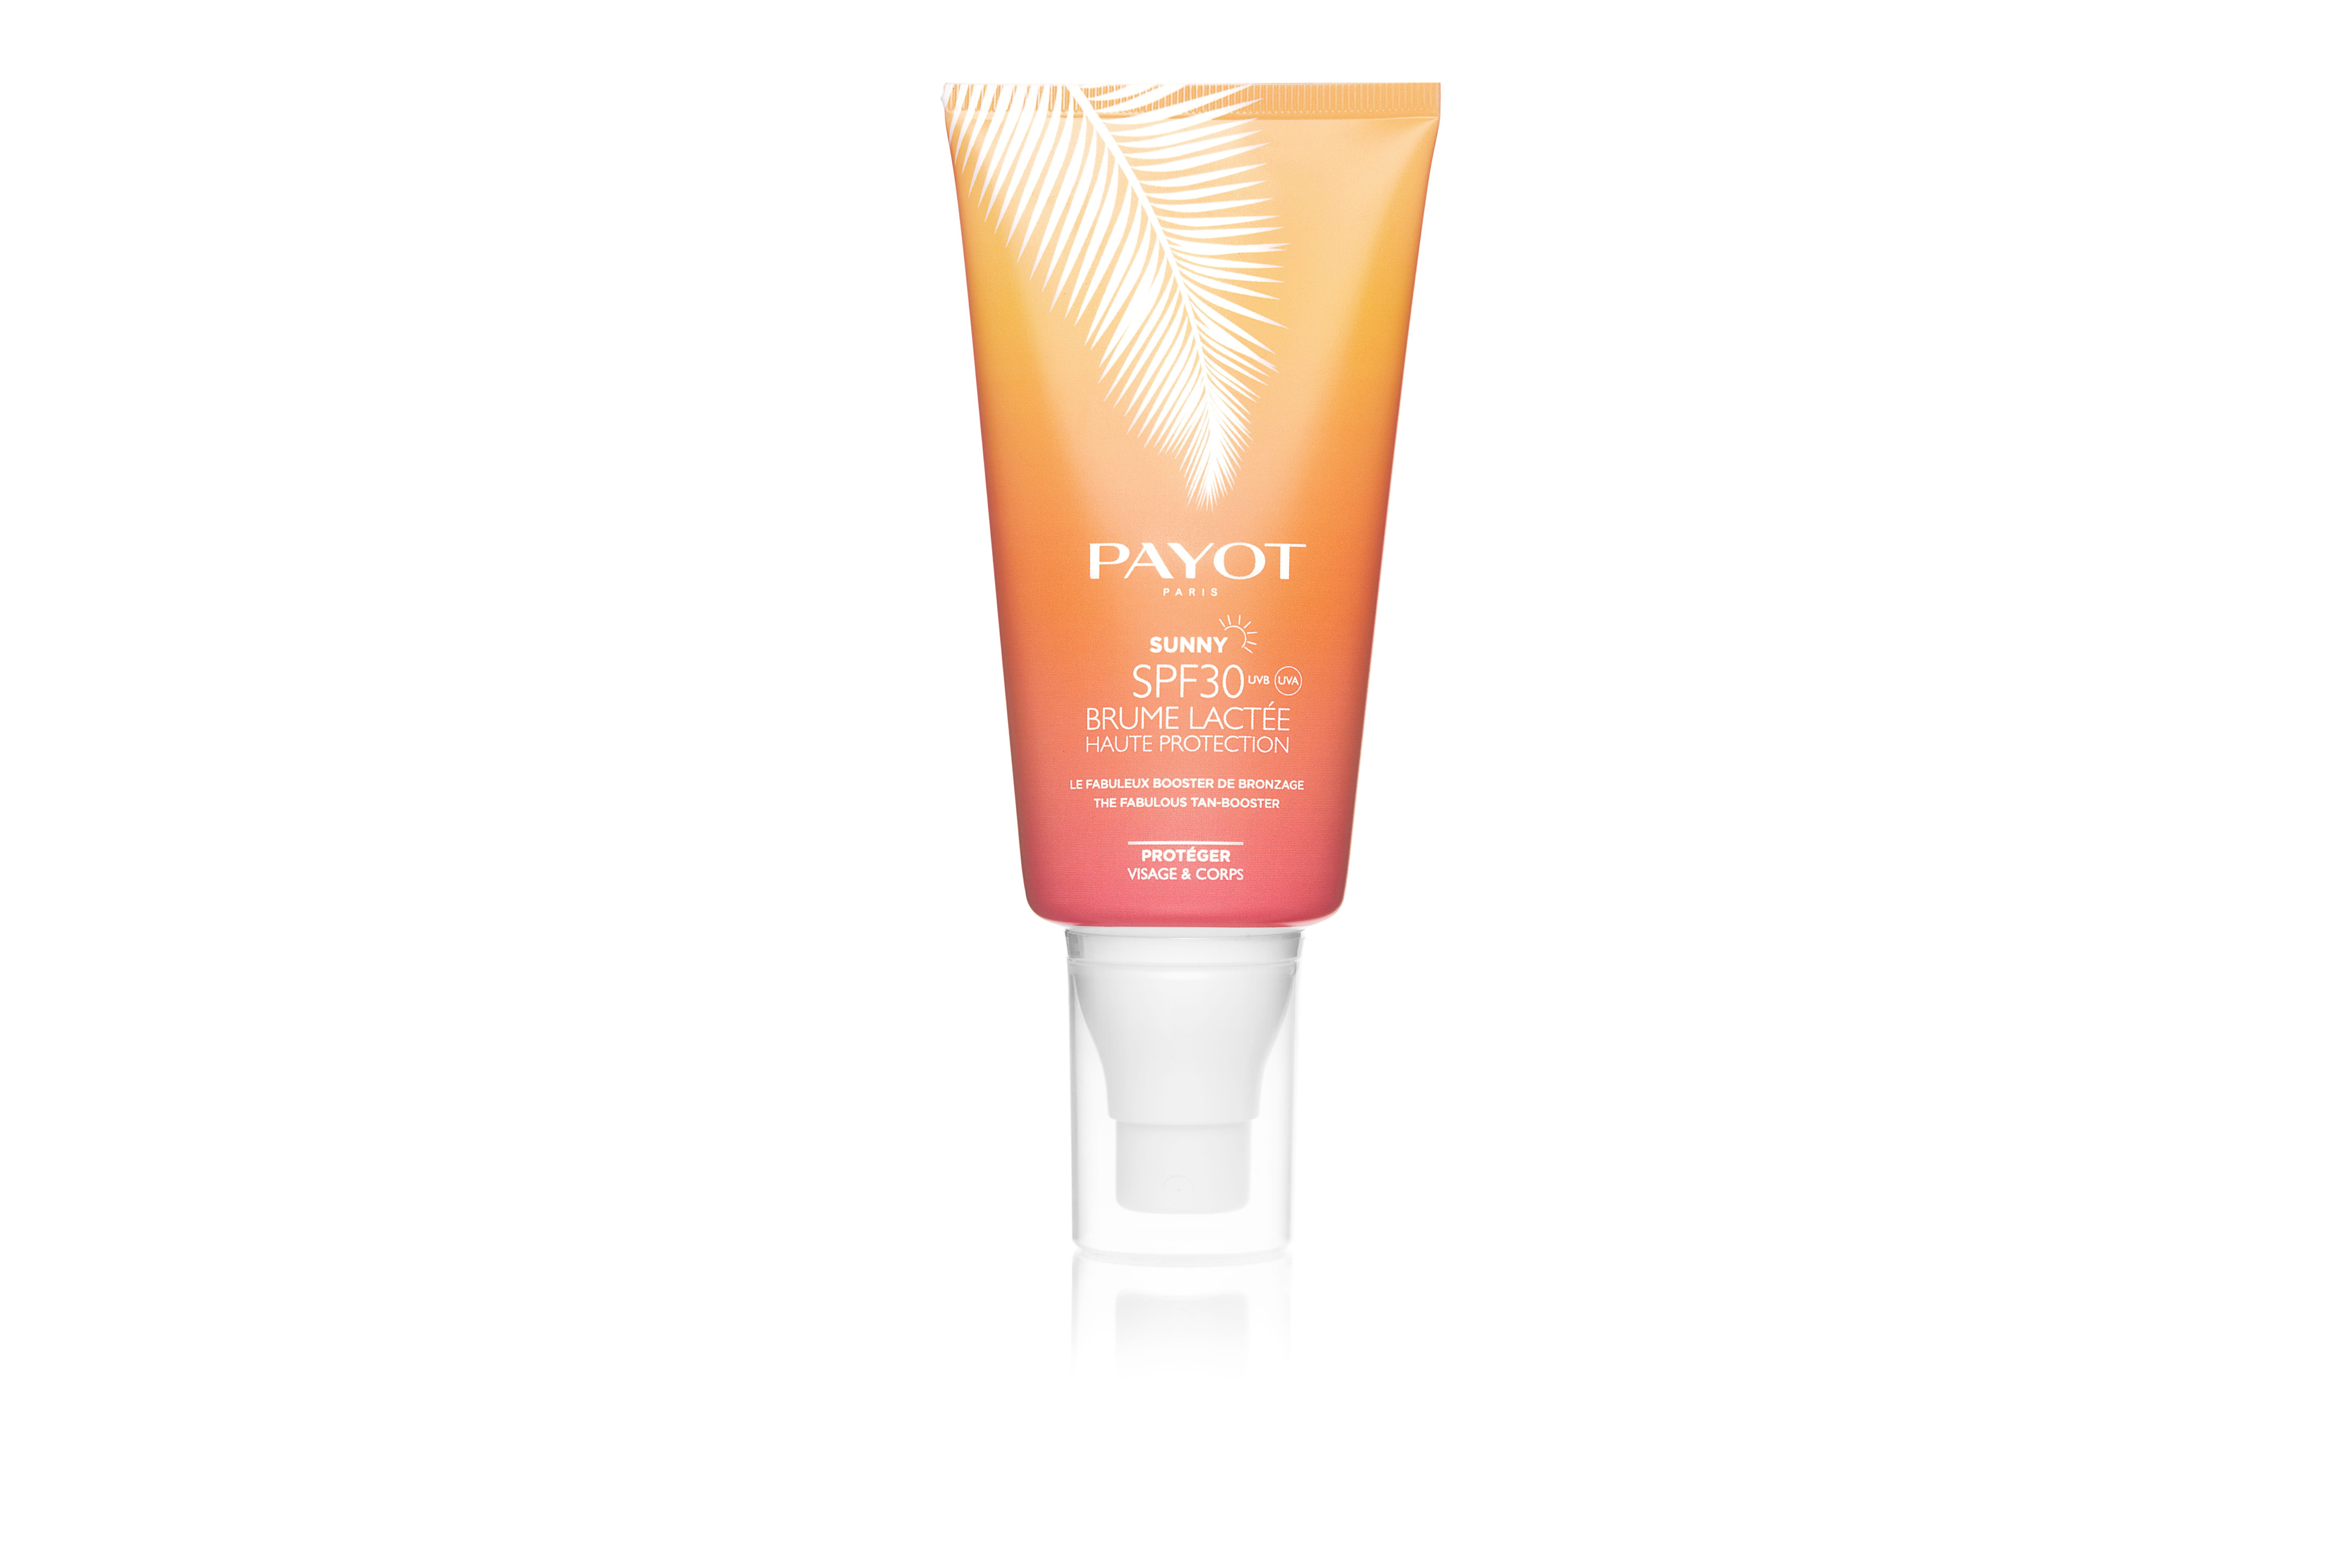 PAYOT Sunny Brume Lactee SPF 30